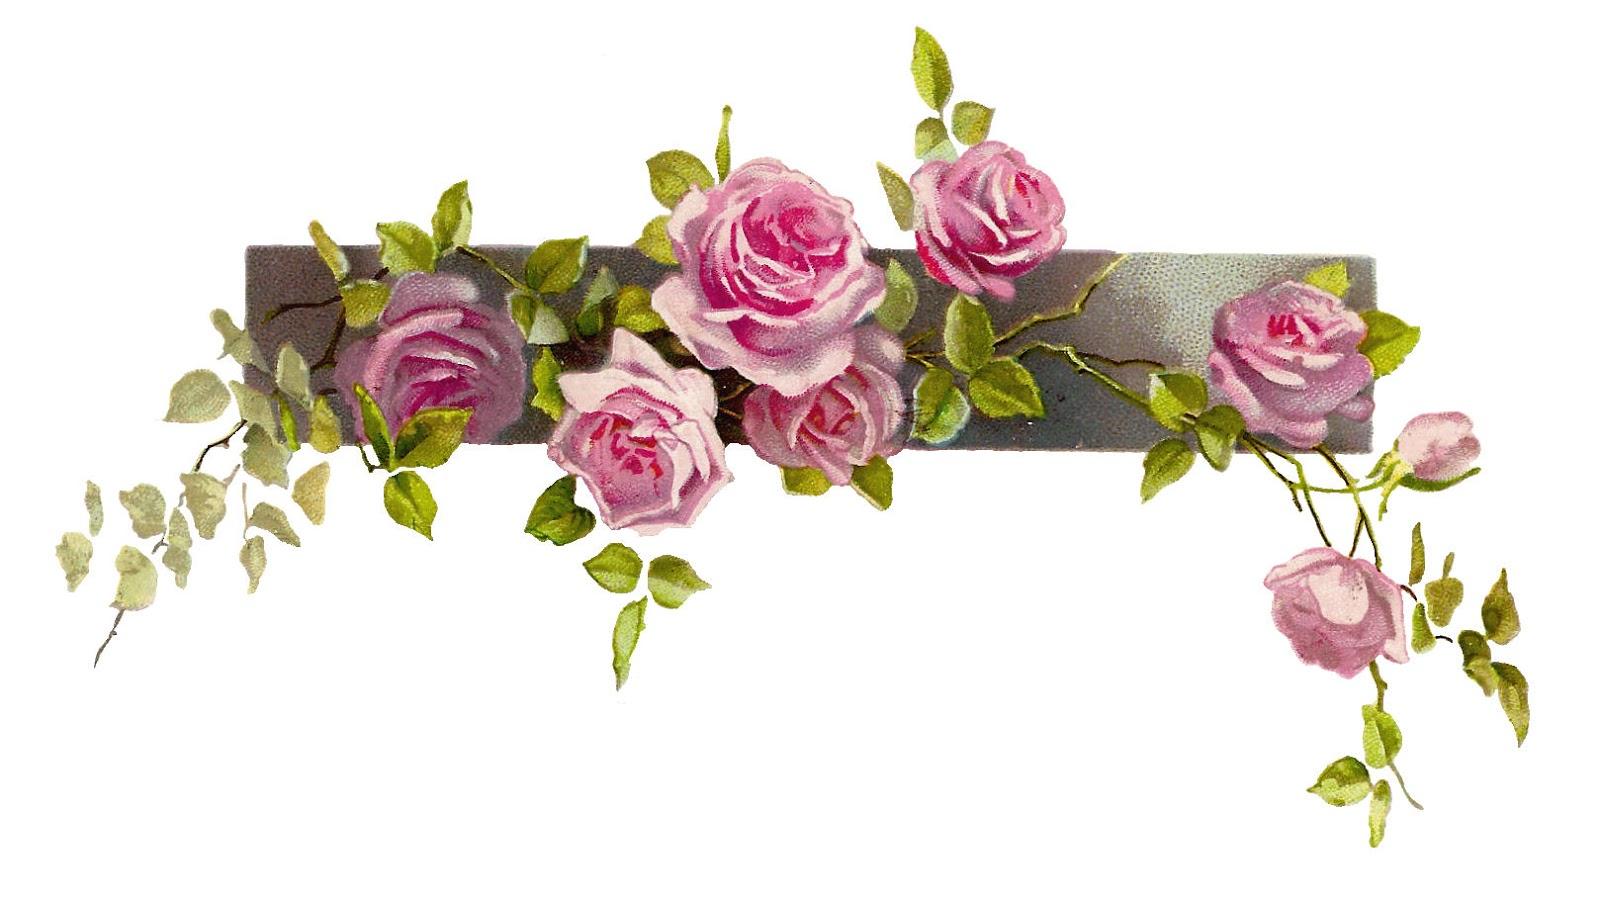 14 Vintage Floral Graphics Images